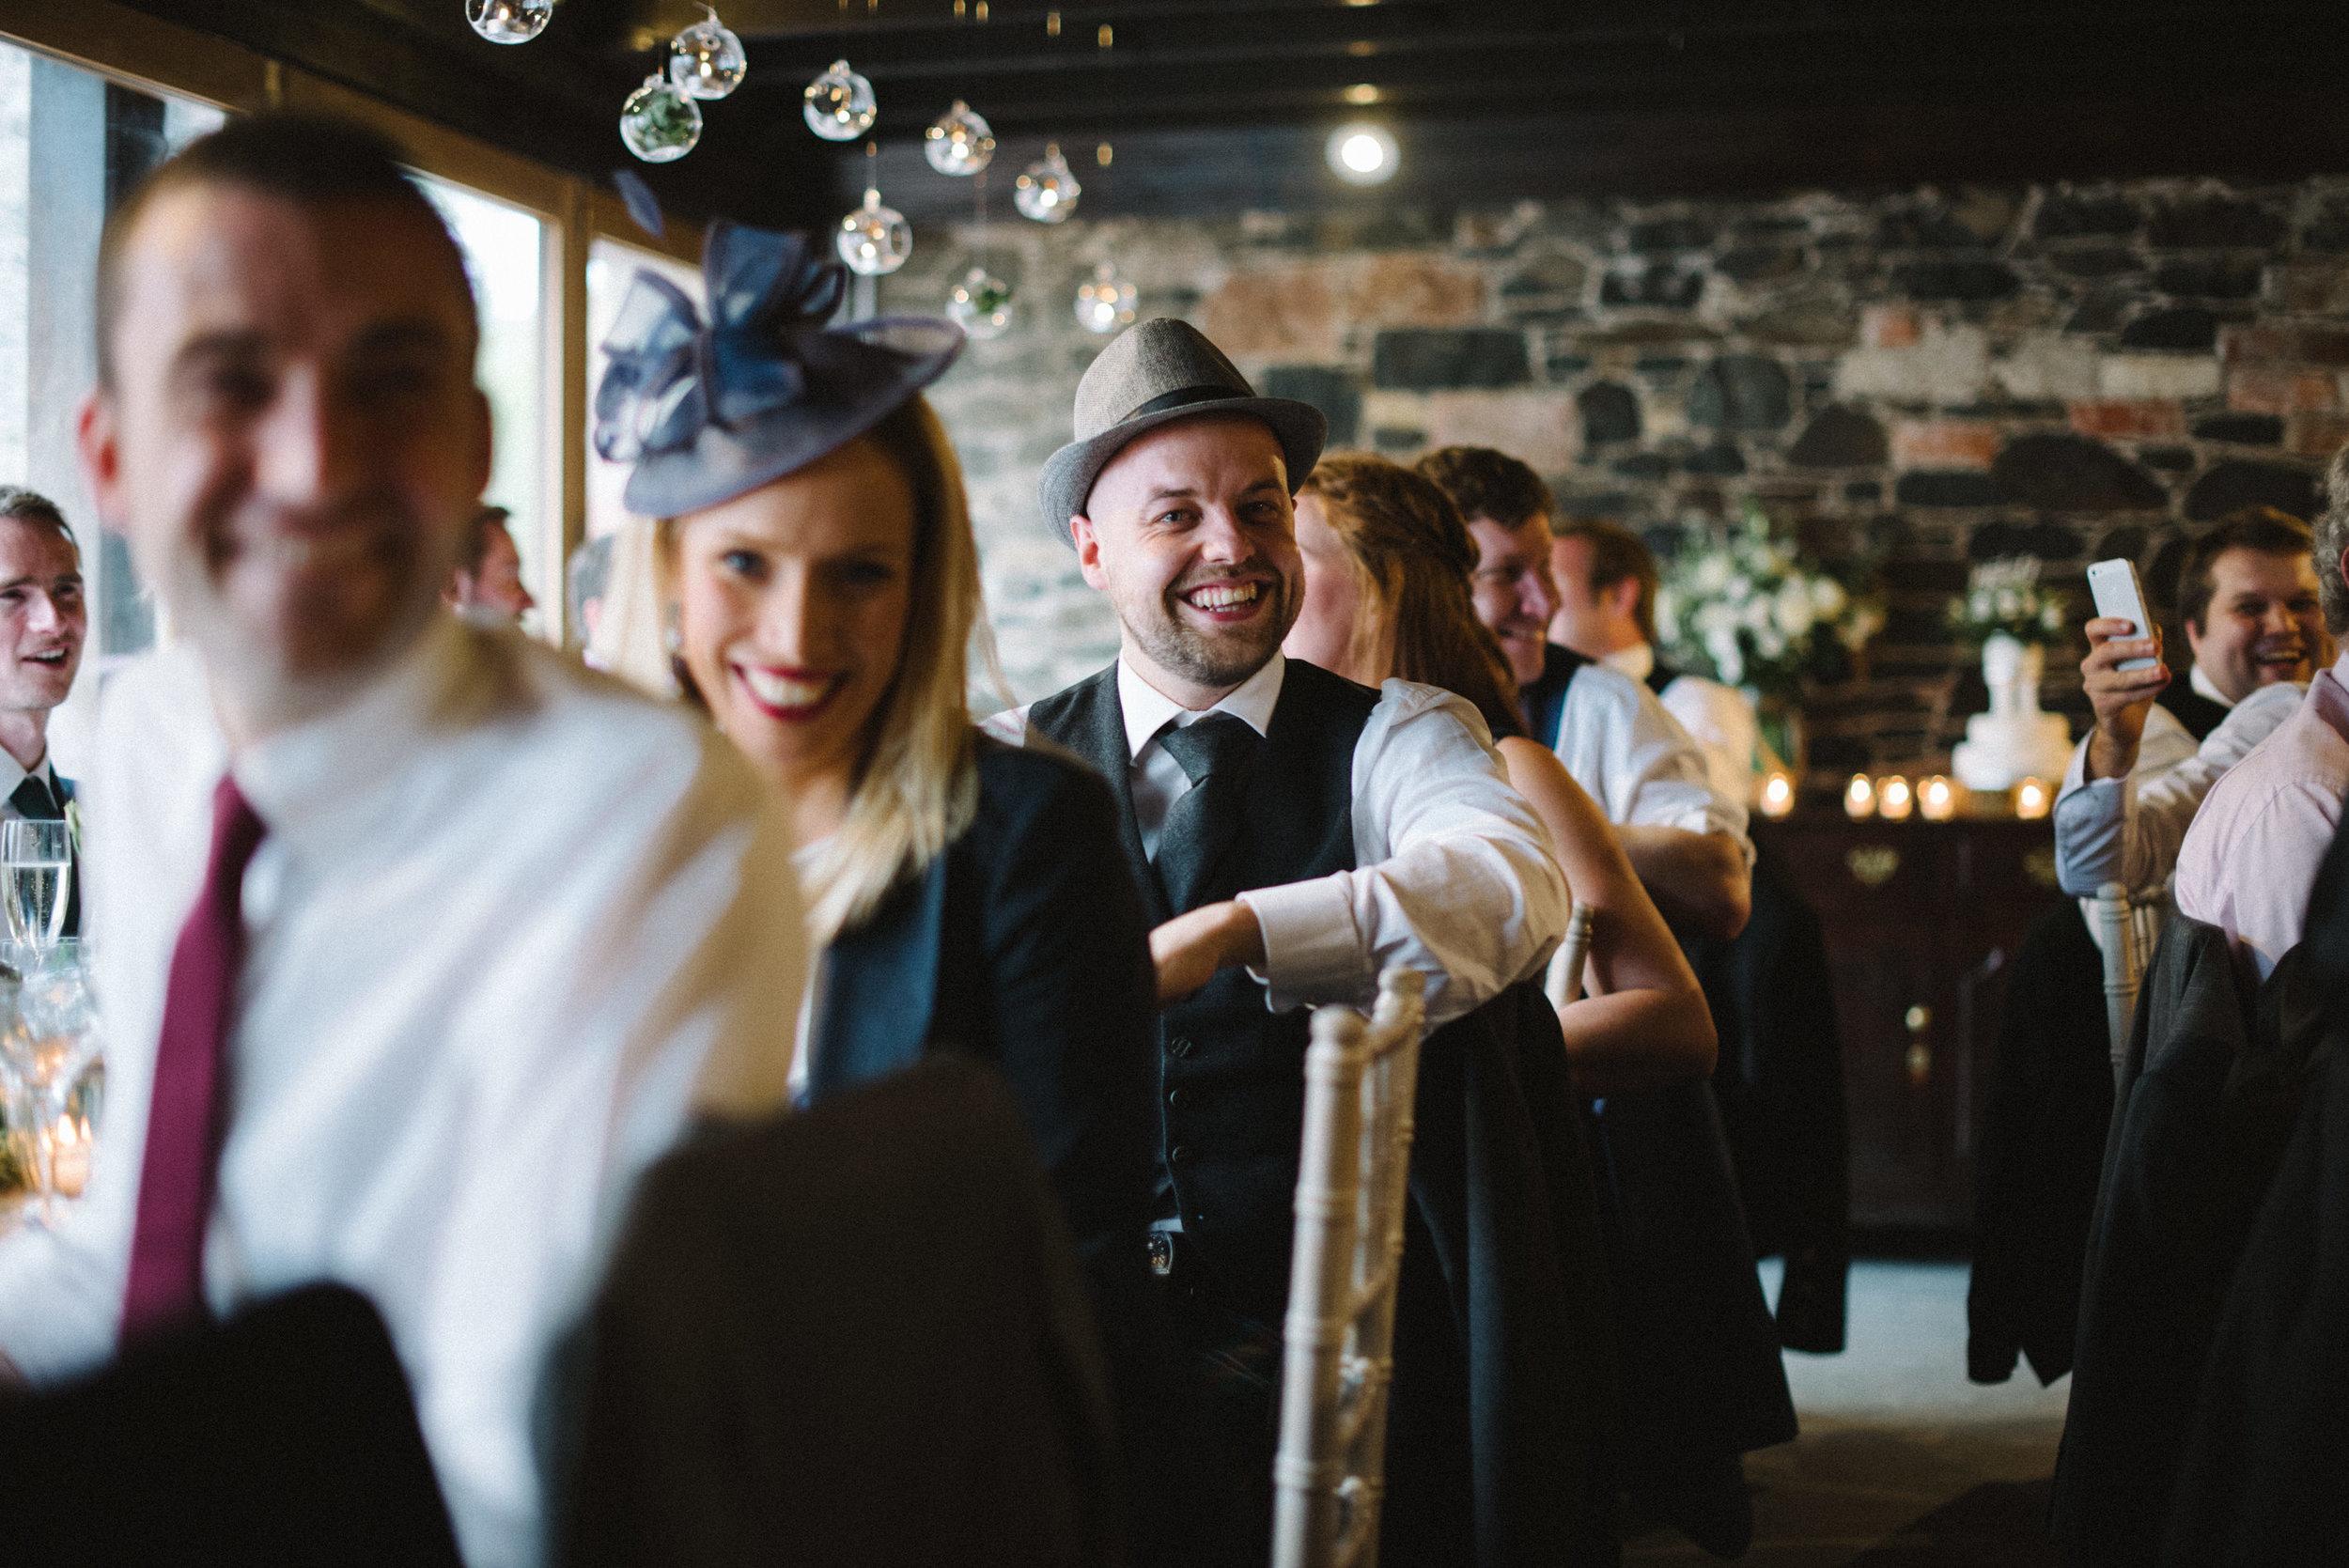 0104-LISA-DEVINE-PHOTOGRAPHY-ALTERNATIVE-WEDDING-PHOTOGRAPHY-SCOTLAND-DESTINATION-WEDDINGS-GLASGOW-WEDDINGS-COOL-WEDDINGS-STYLISH-WEDDINGS.JPG